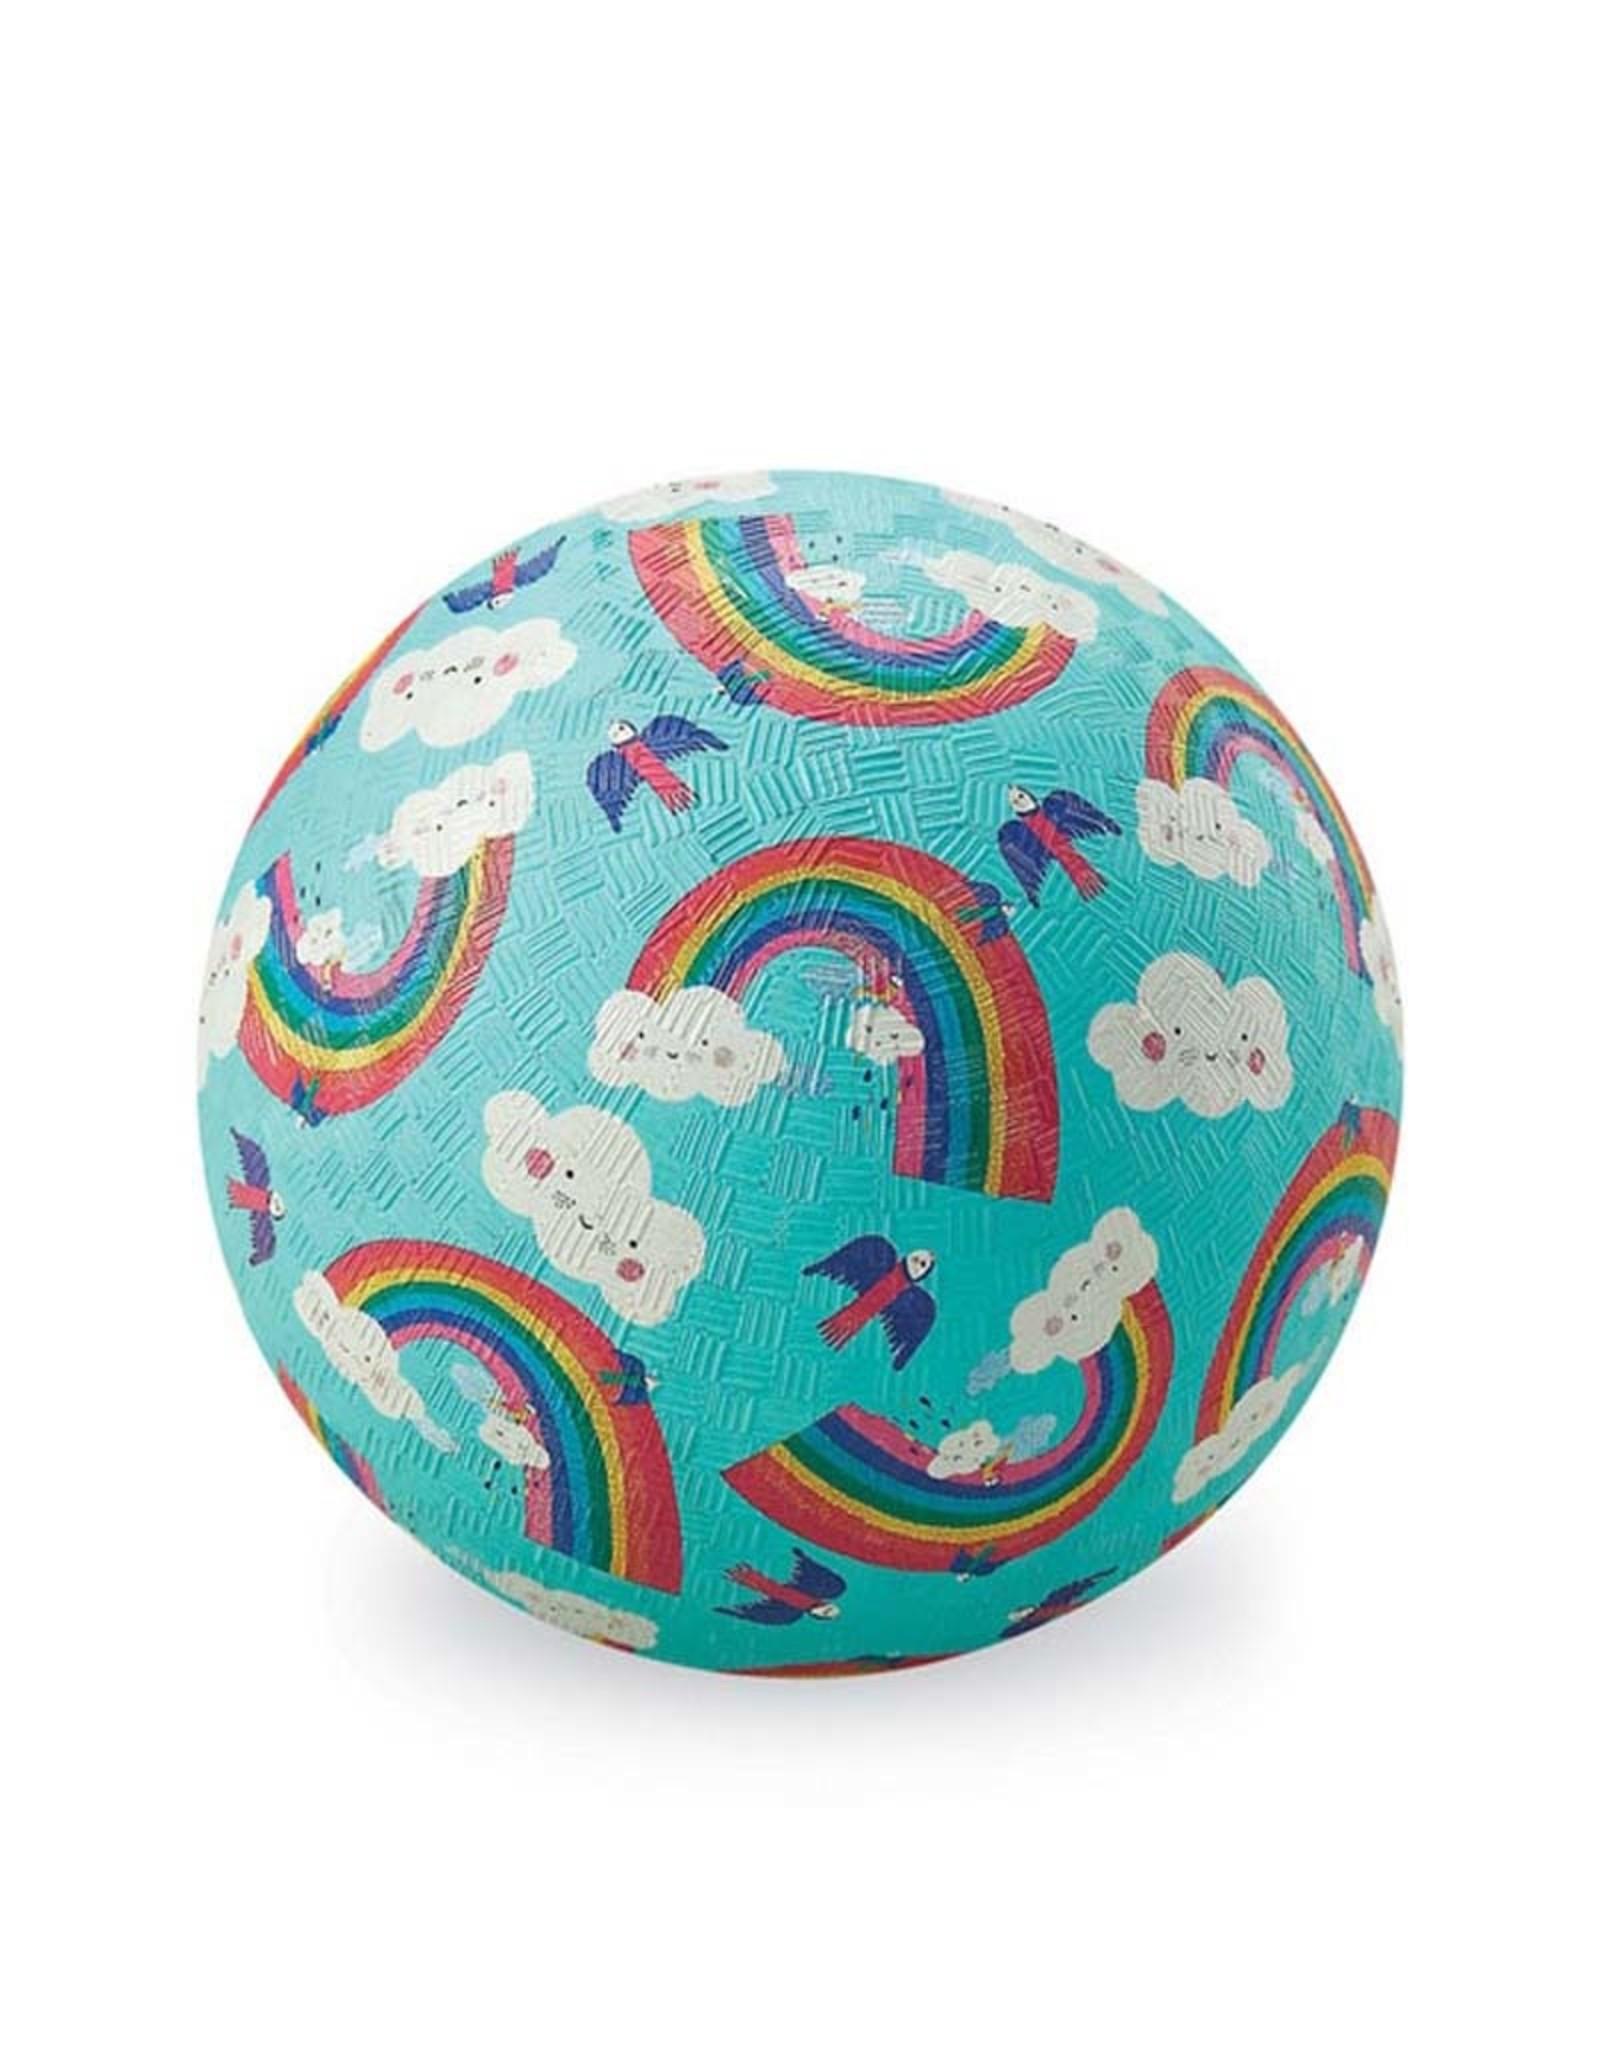 "Crocodile Creek 7"" Playground Ball Rainbow Dreams"